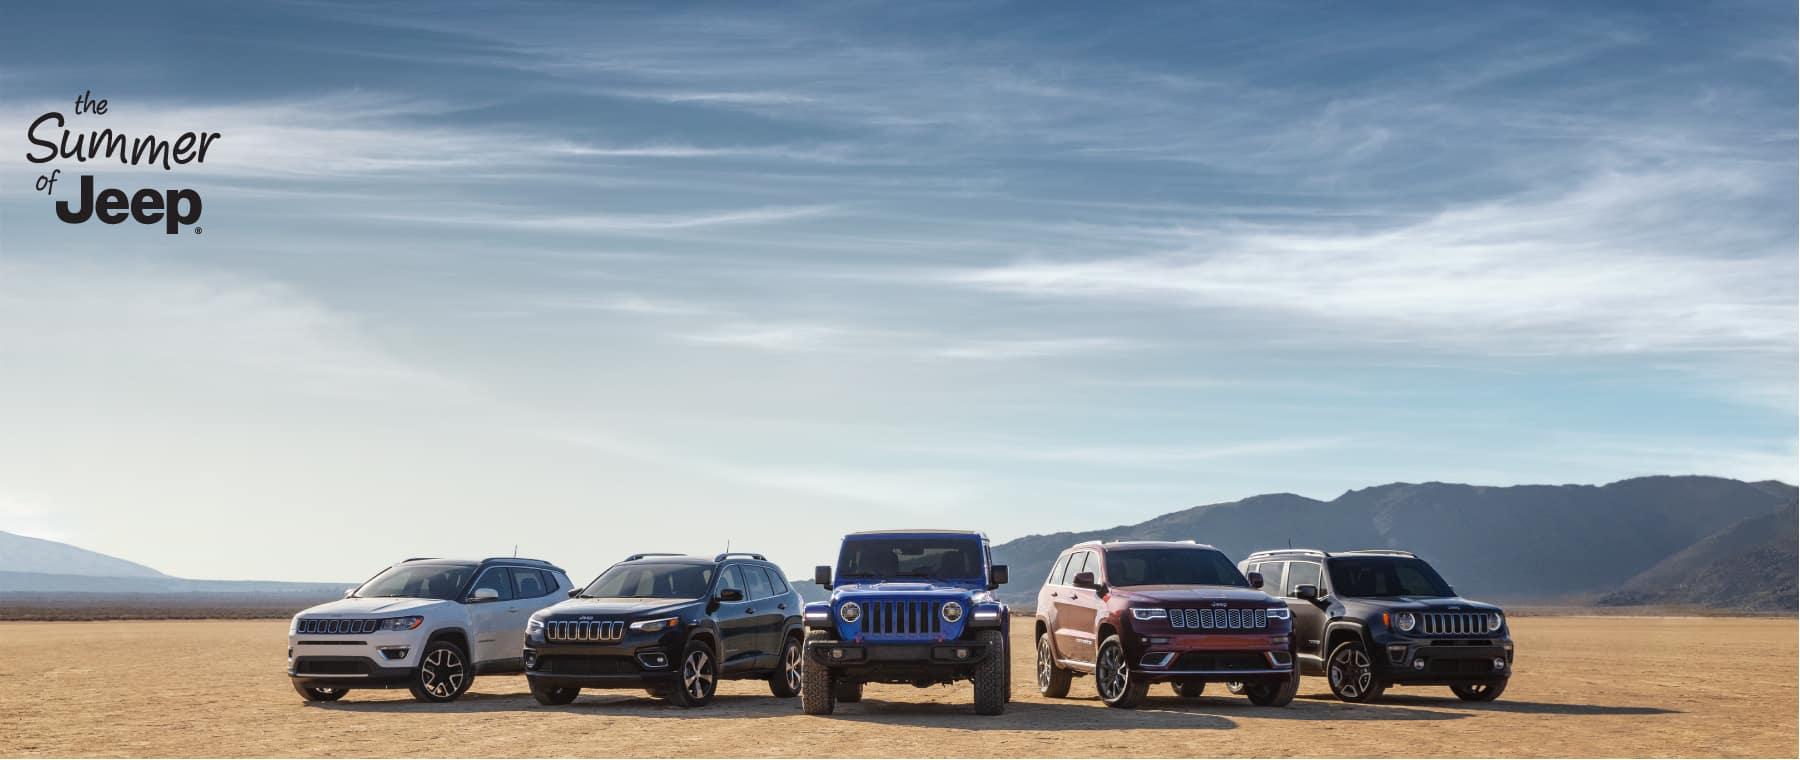 Dodge Dealers In Az >> Bill Luke Chrysler Jeep Dodge Ram I 17 Camelback Phoenix Az 85015